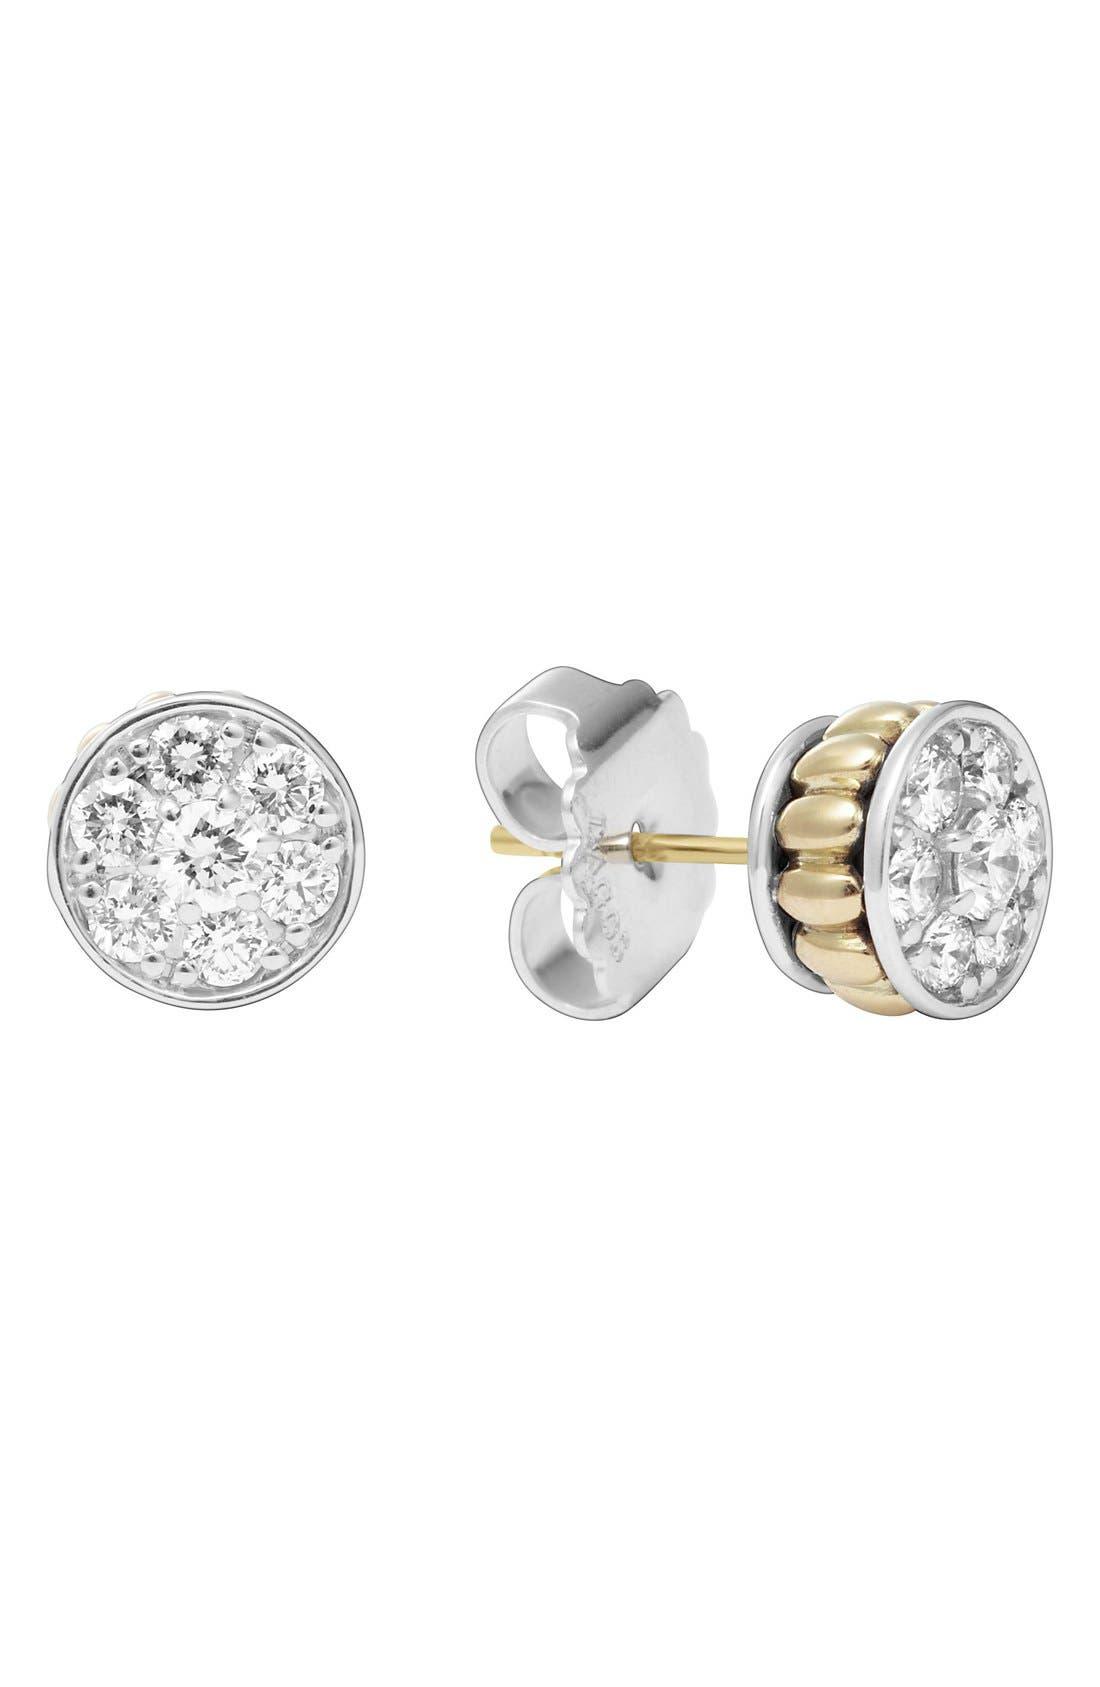 LAGOS Diamond & Caviar Stud Earrings